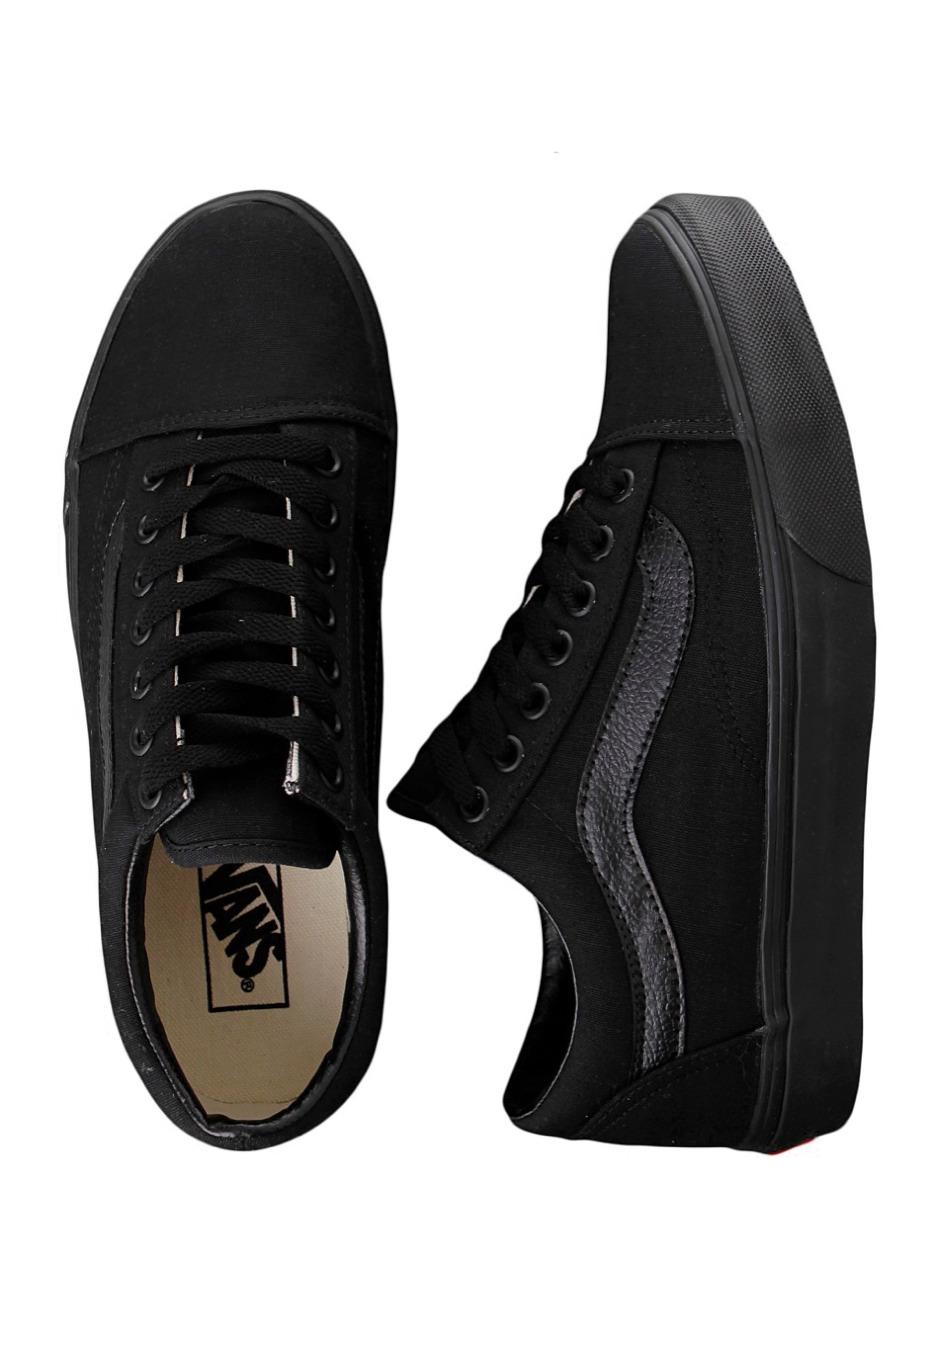 Vans - Old Skool Black Black - Girl Shoes - Impericon.com UK 52dd6fab0